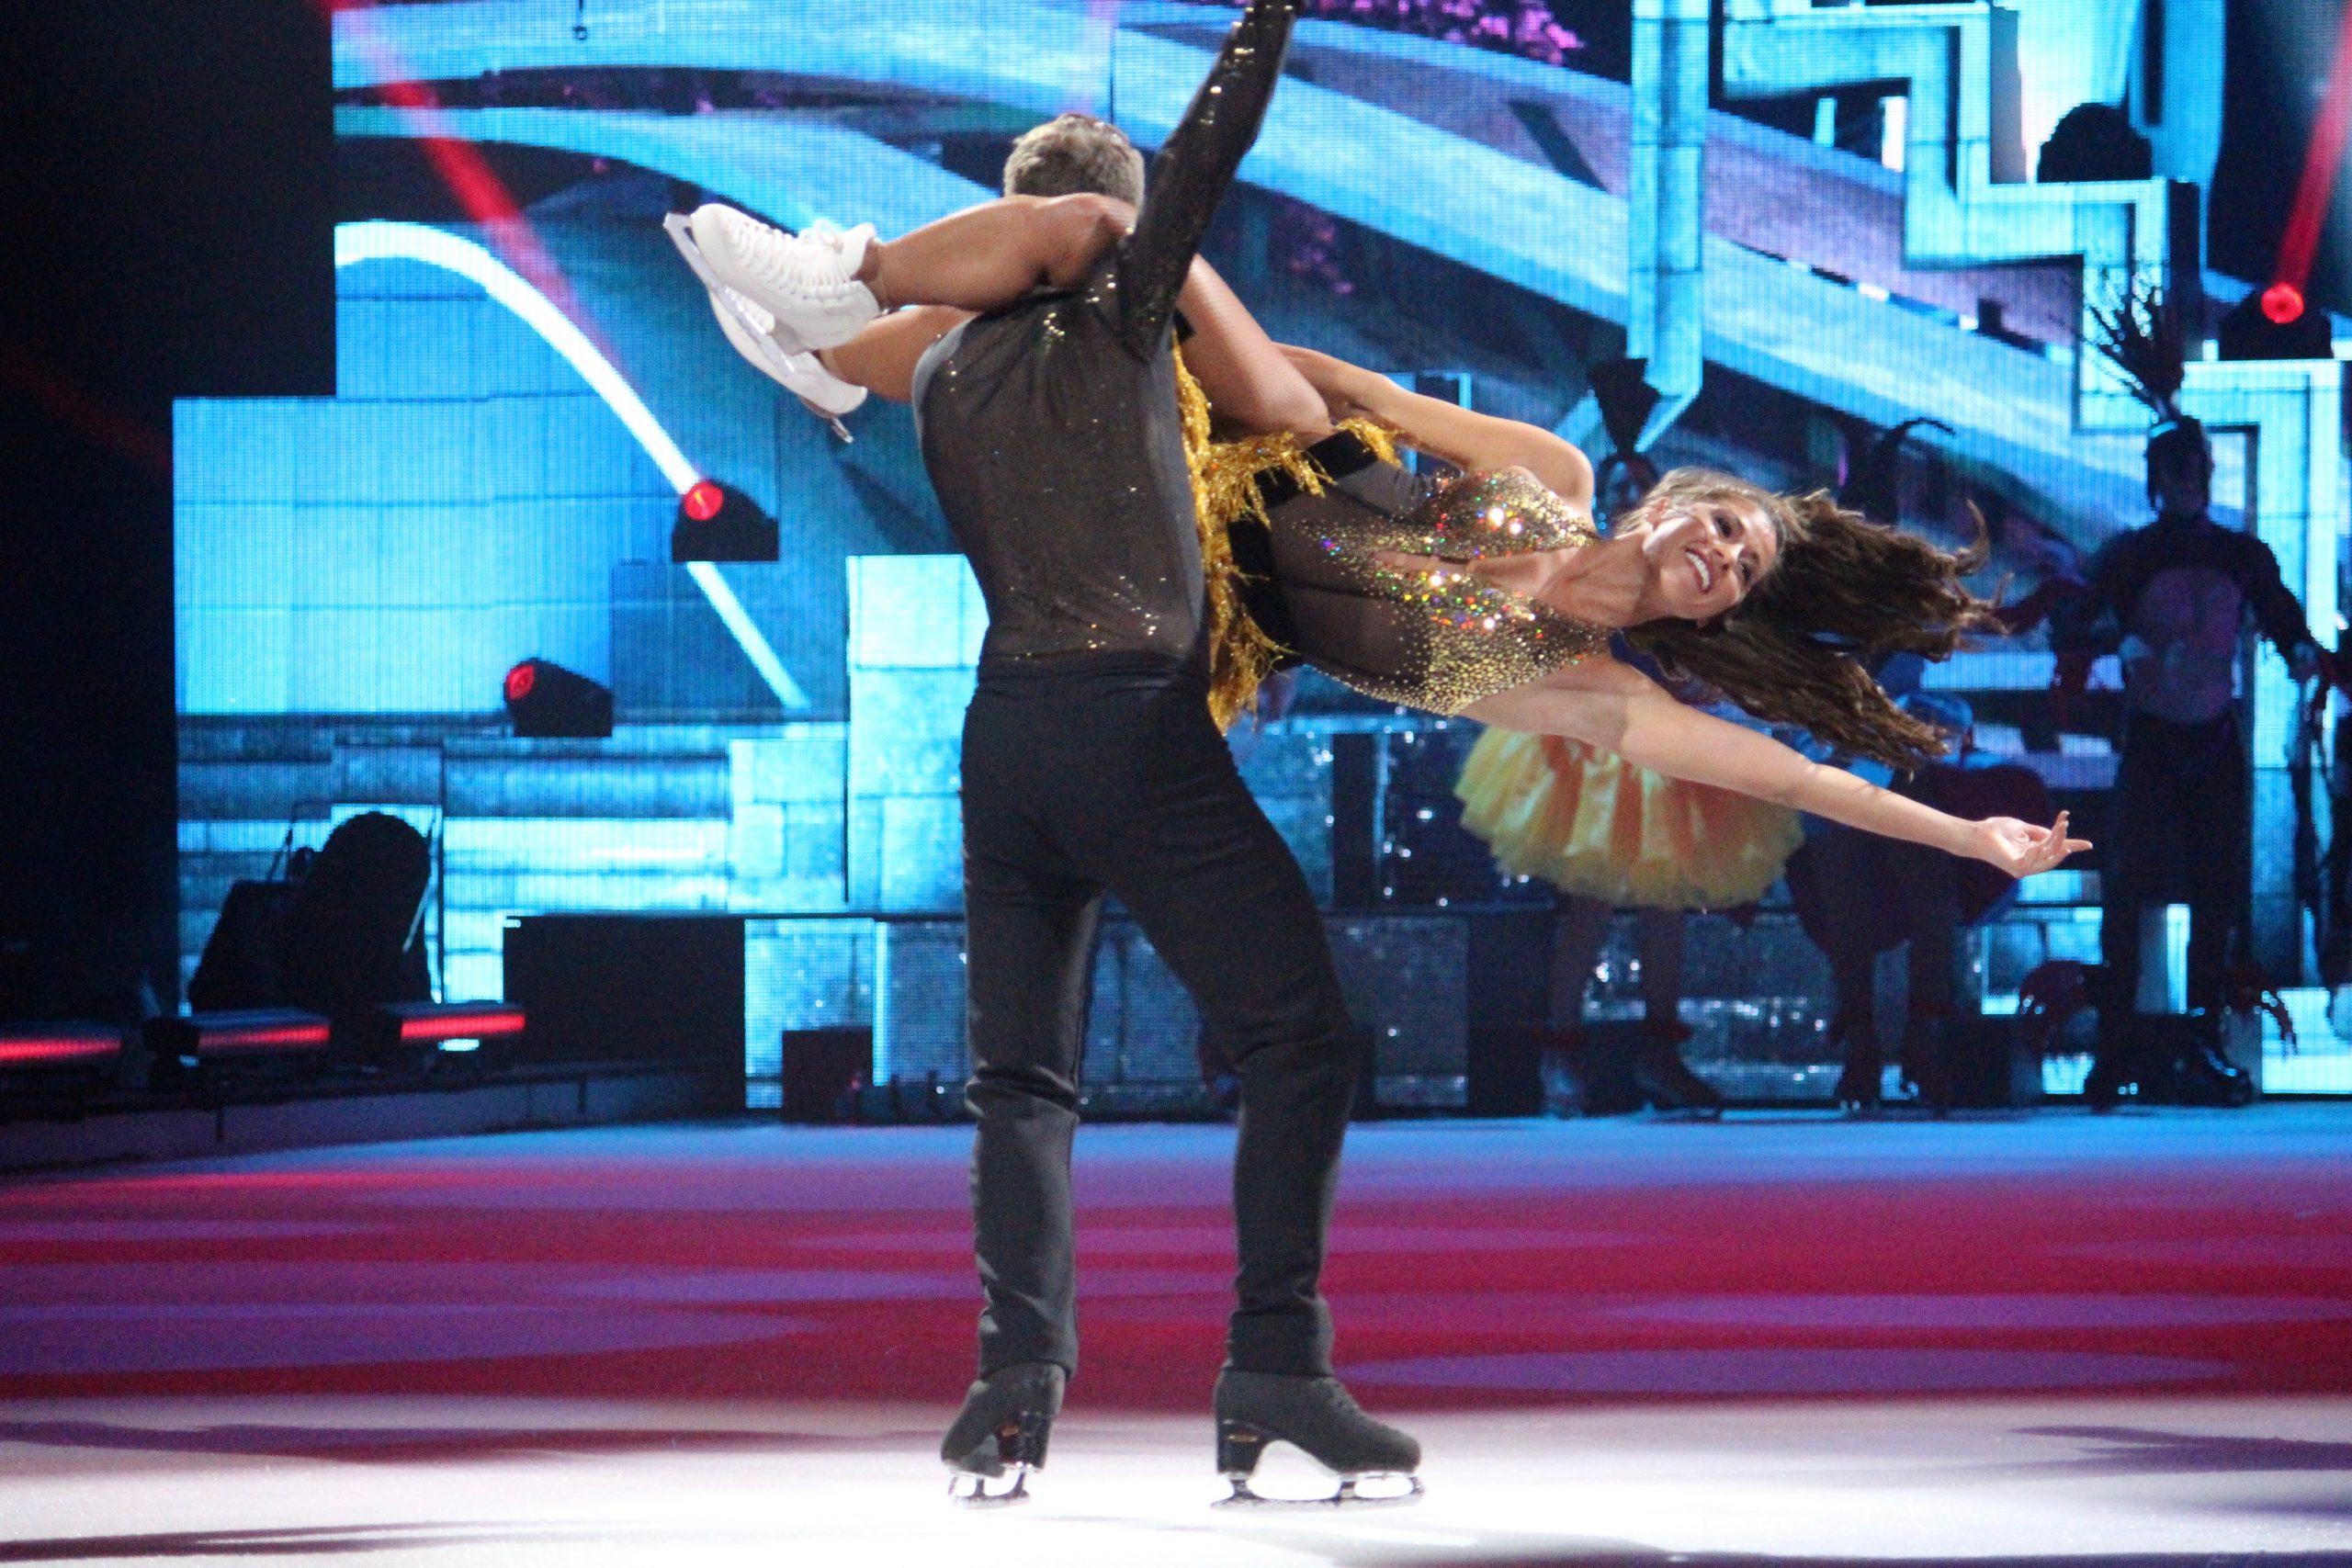 pm -Joti Polizoakis wirbelte das Multitalent Sarah Lombardi über das Eis